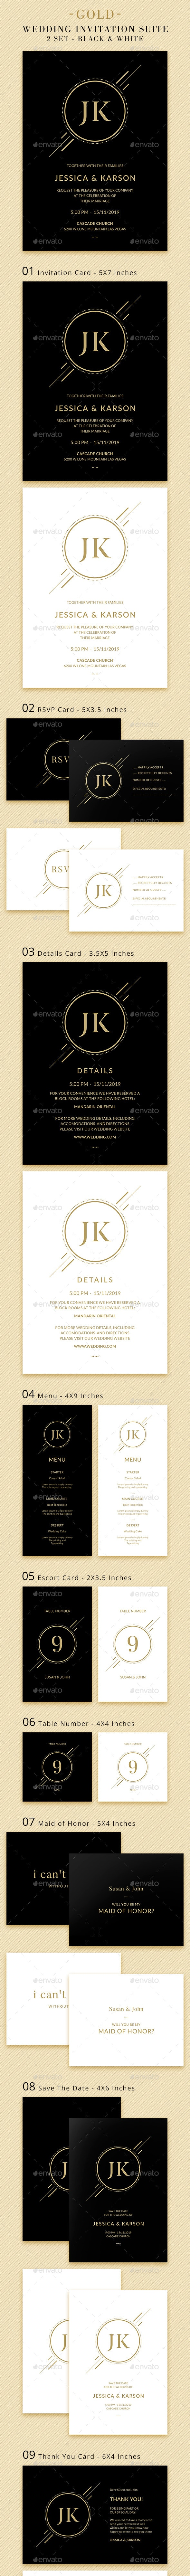 Wedding Invitation Suite - Gold - Weddings Cards & Invites